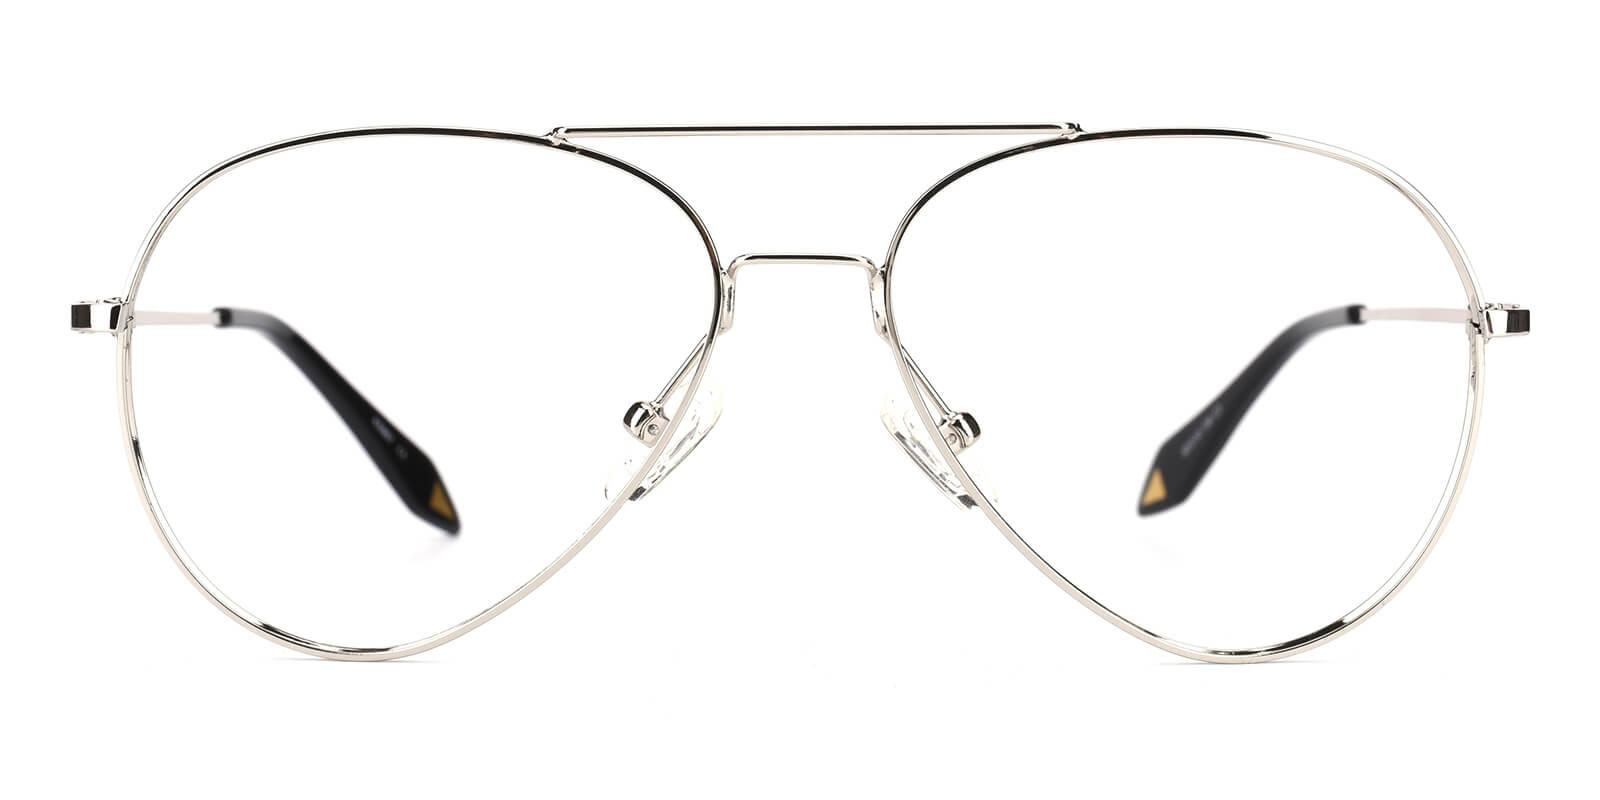 Pilot-Silver-Aviator-Metal-Eyeglasses-additional2